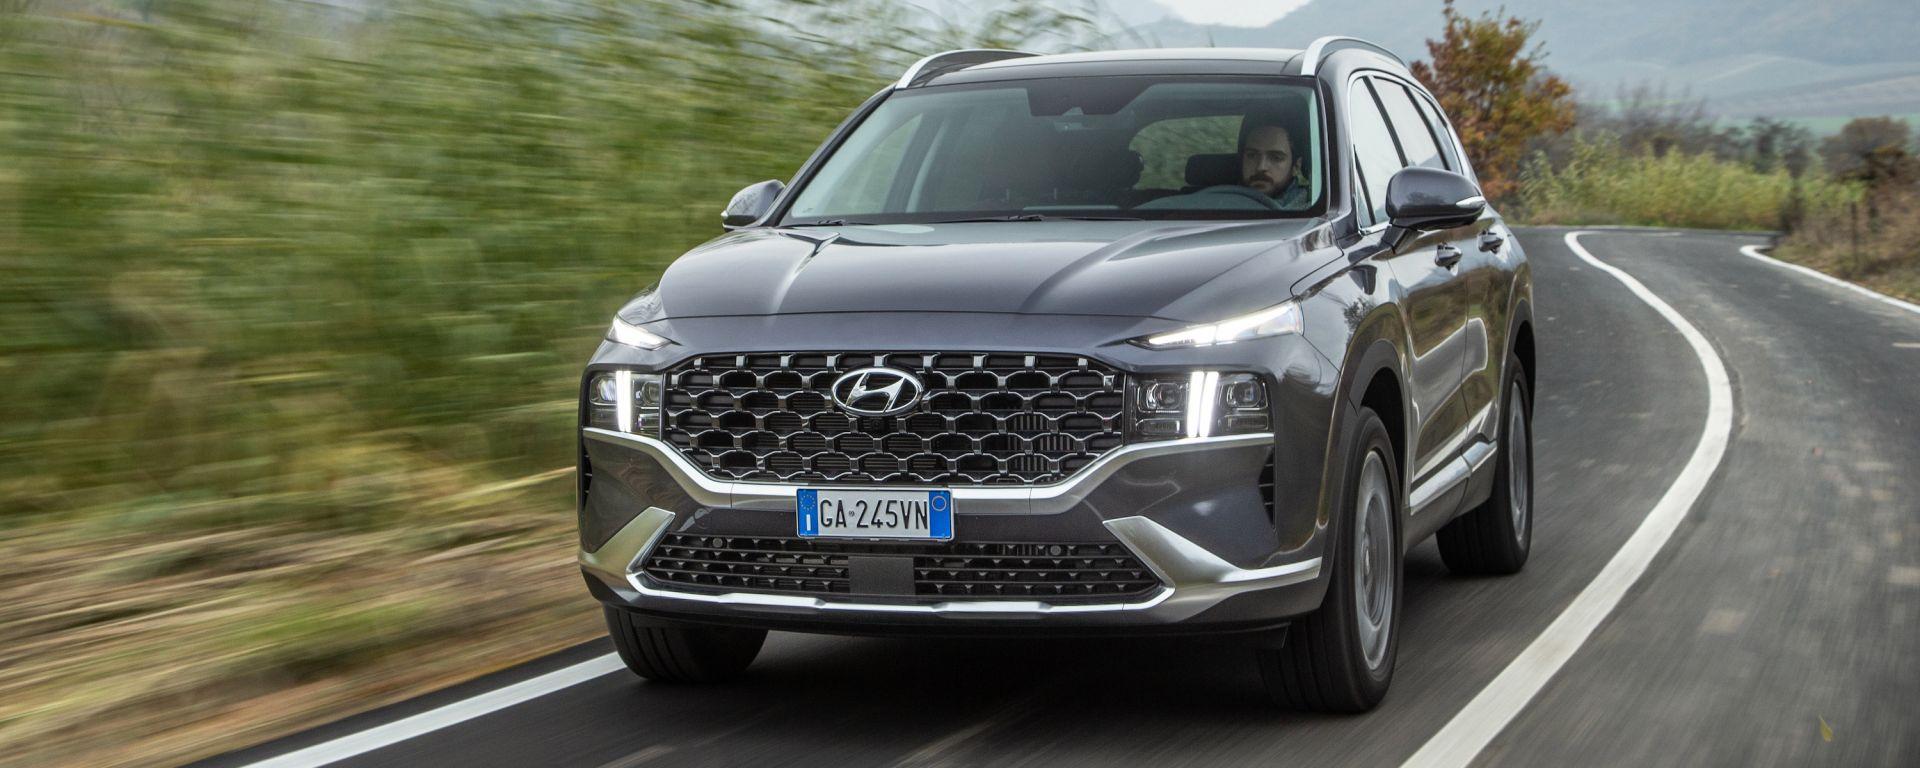 Nuova Hyundai Santa Fe: il SUV diventa full hybrid